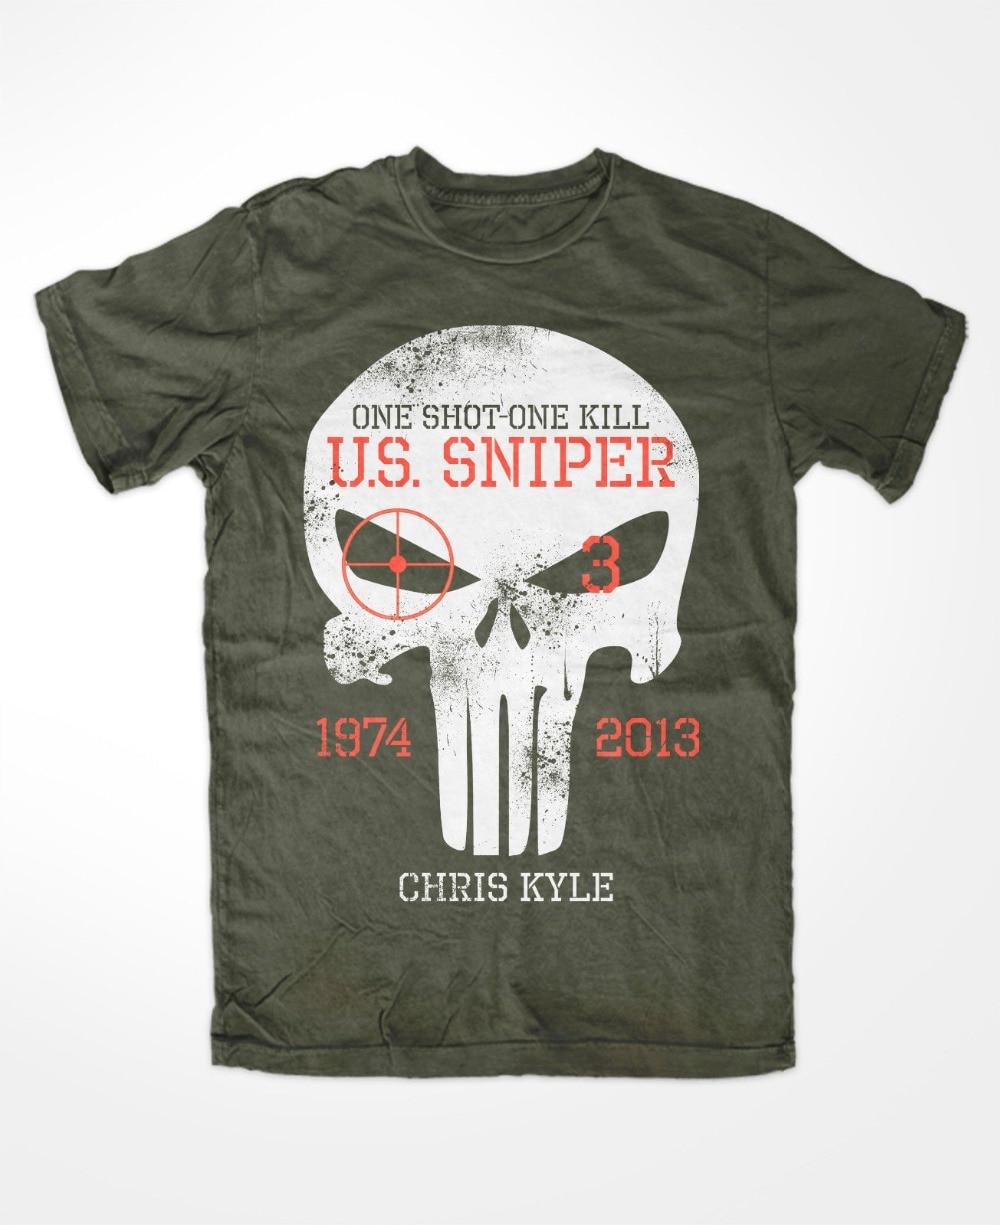 Chris Kyle T-Shirt Oliv The Devil Of Ramadi American Sniper Scharfschutze Cpo Newest 2019 Fashion O-Neck Brand Men'S Tee Shirt